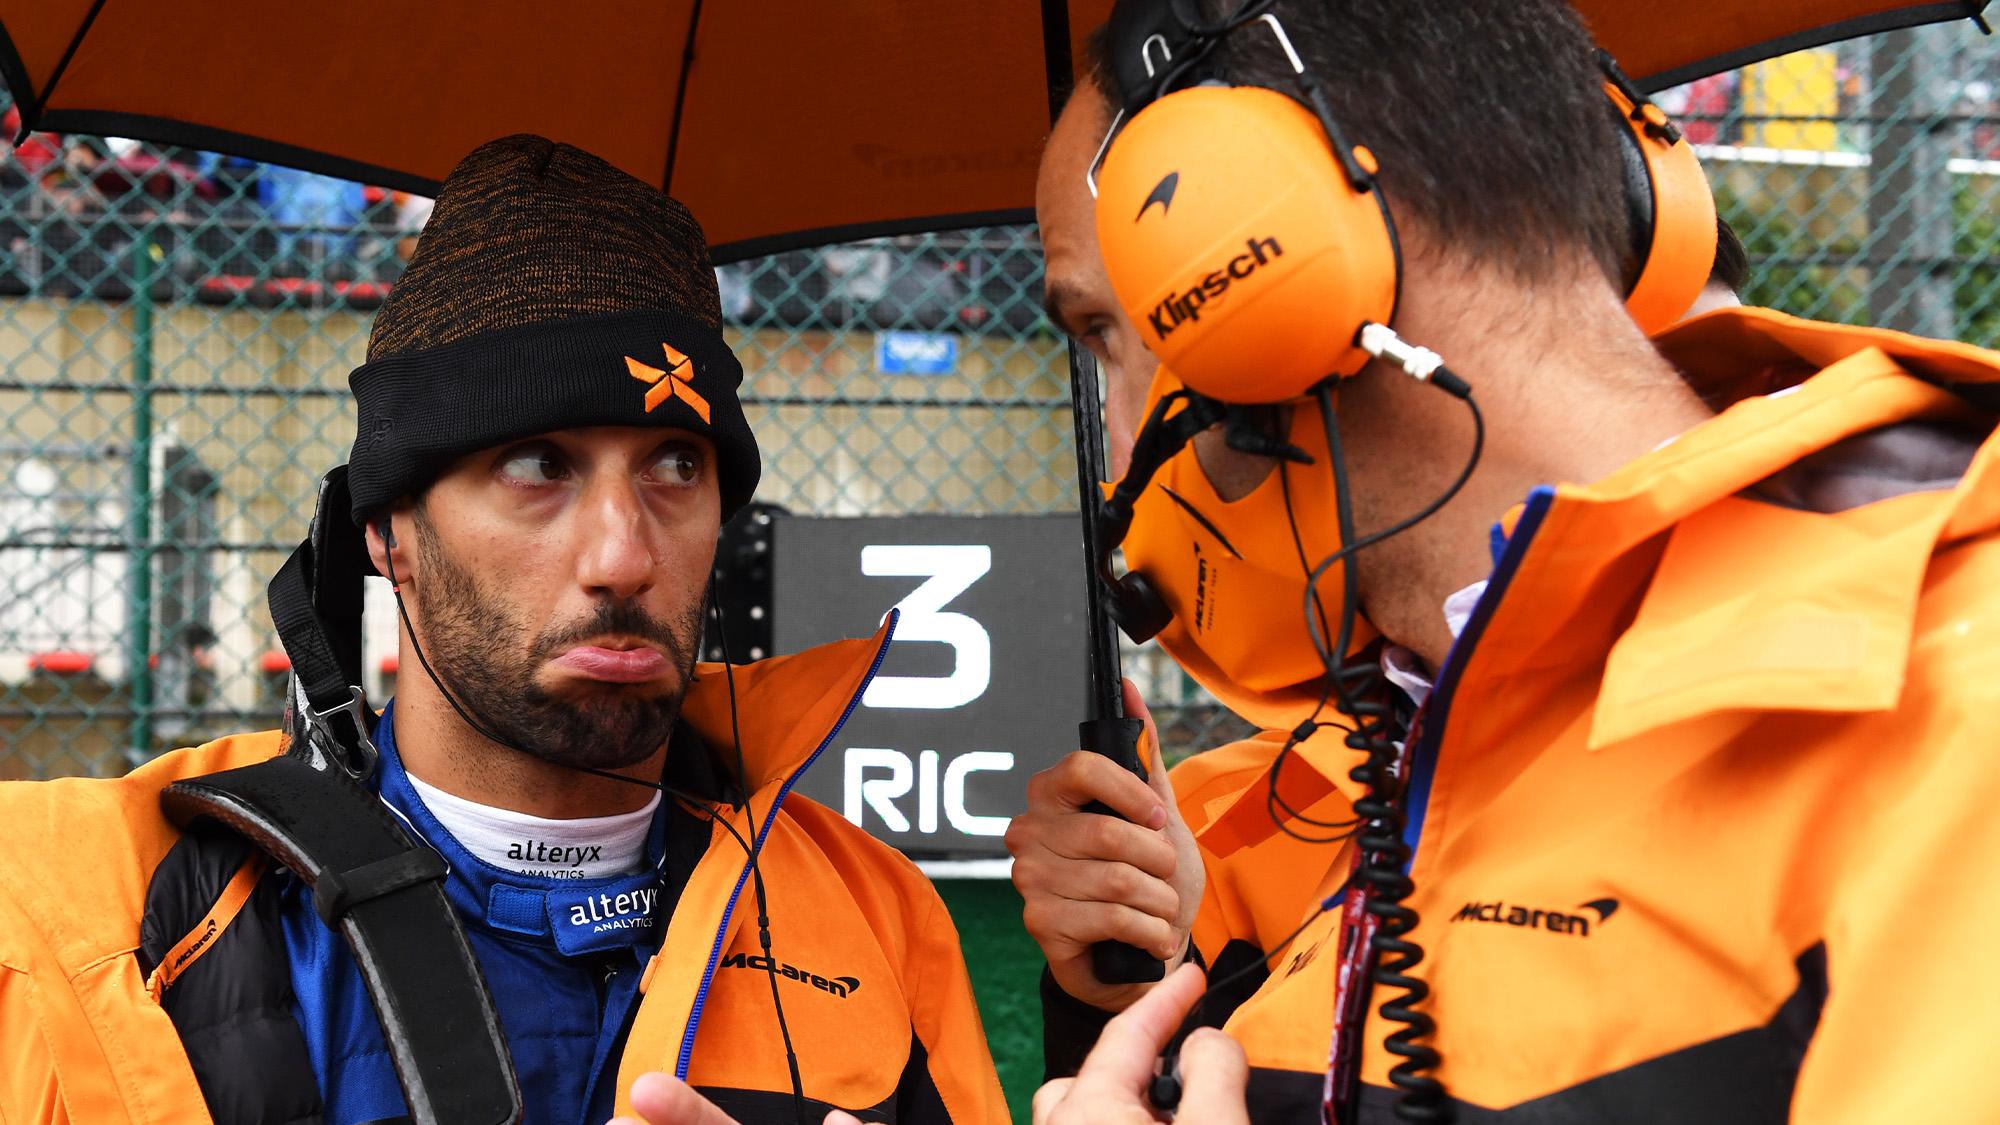 Daniel Ricciardo pokes his bottom lip out during 2021 Belgian Grand Prix rain delay